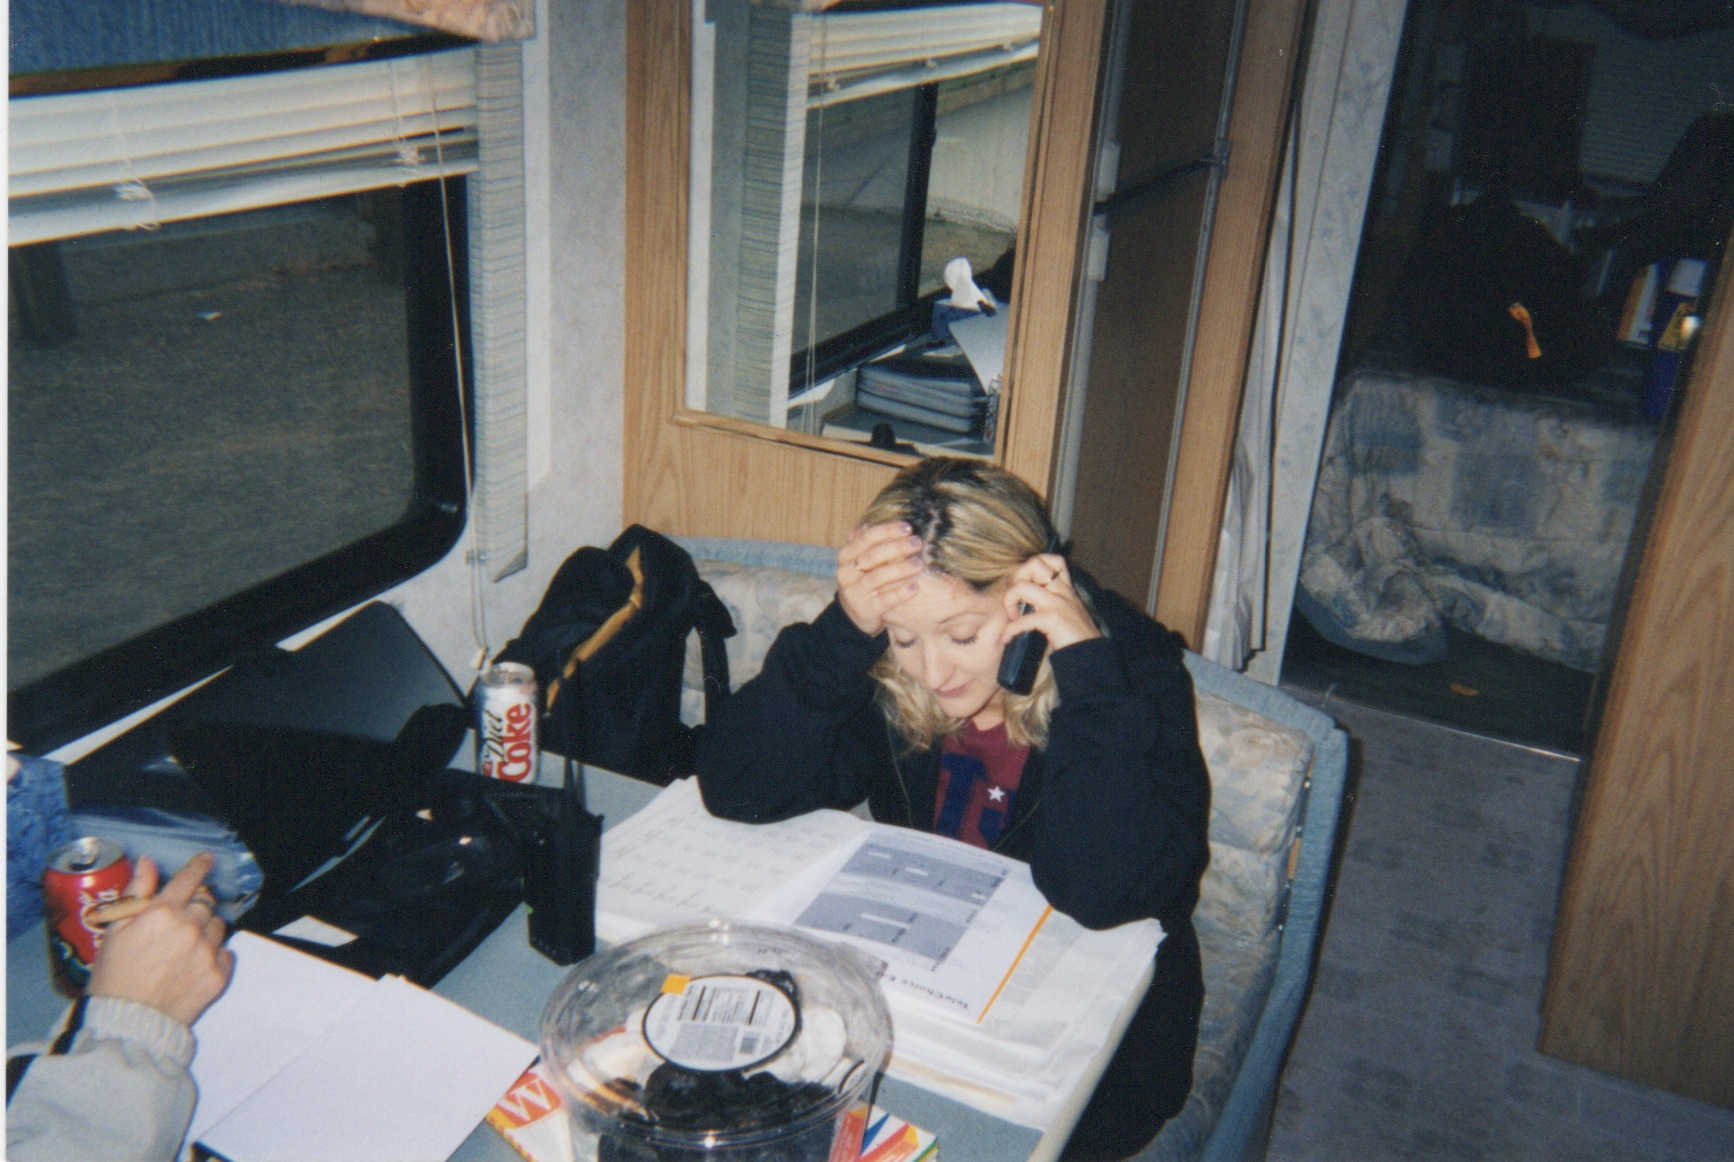 Phoebe's Phone Calls